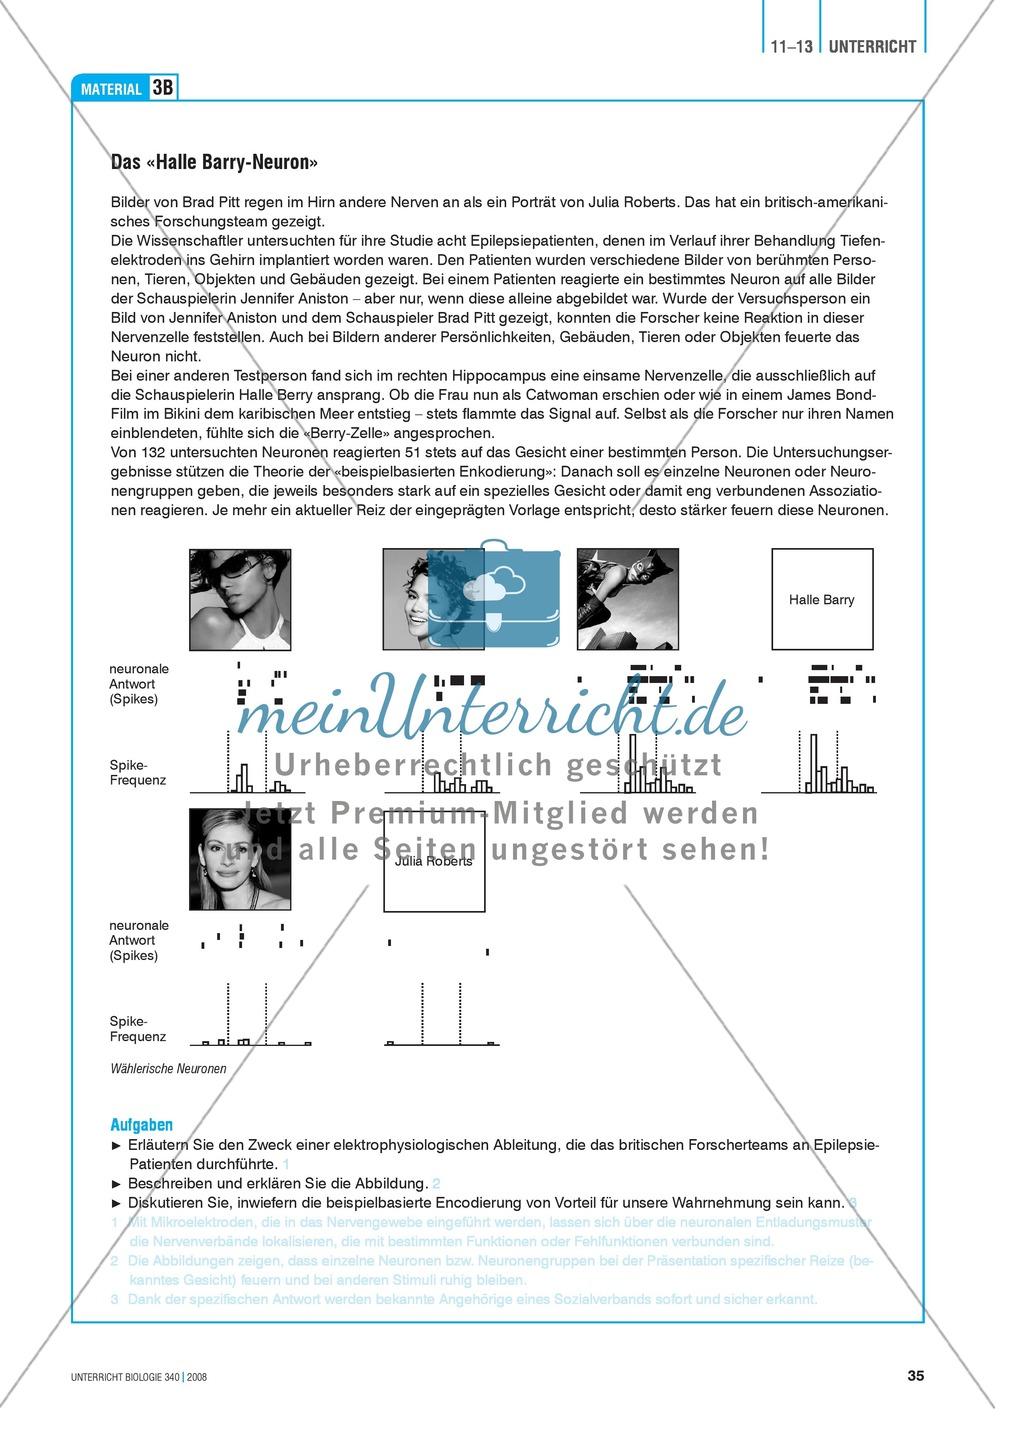 Charmant Das Neuron Arbeitsblatt Bilder - Mathe Arbeitsblatt ...